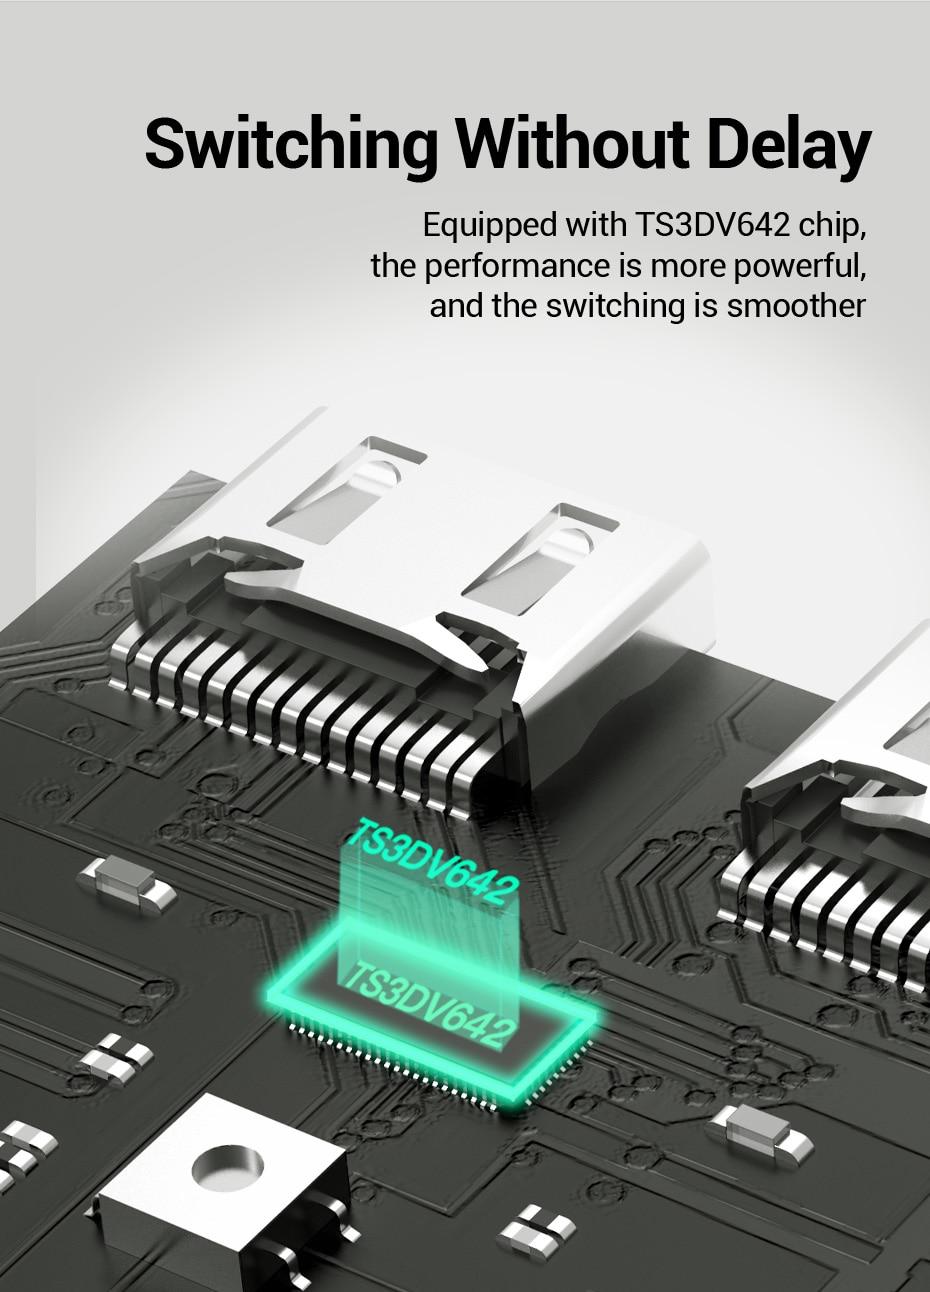 4K HDMI Switch 2 Ports Bi-directional 1x2 / 2x1 HDMI Switcher Splitter Supports H6919dbb01c794a259eb4375e9daff9d2j